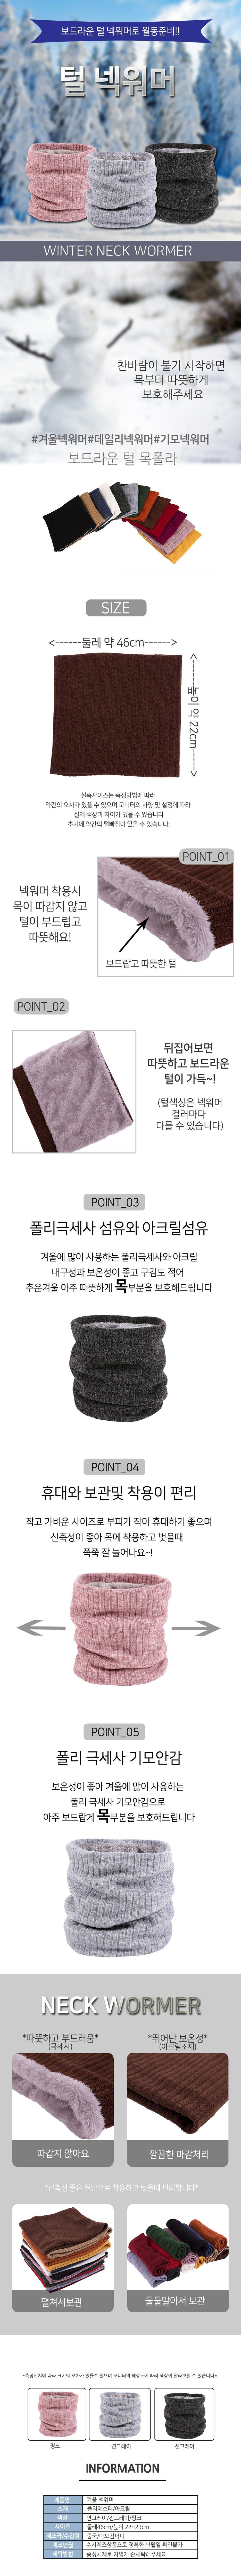 Winter 보드라운 넥워머 방한용품 CH1523888 - 익스트리모, 11,000원, 머플러, 니트 머플러